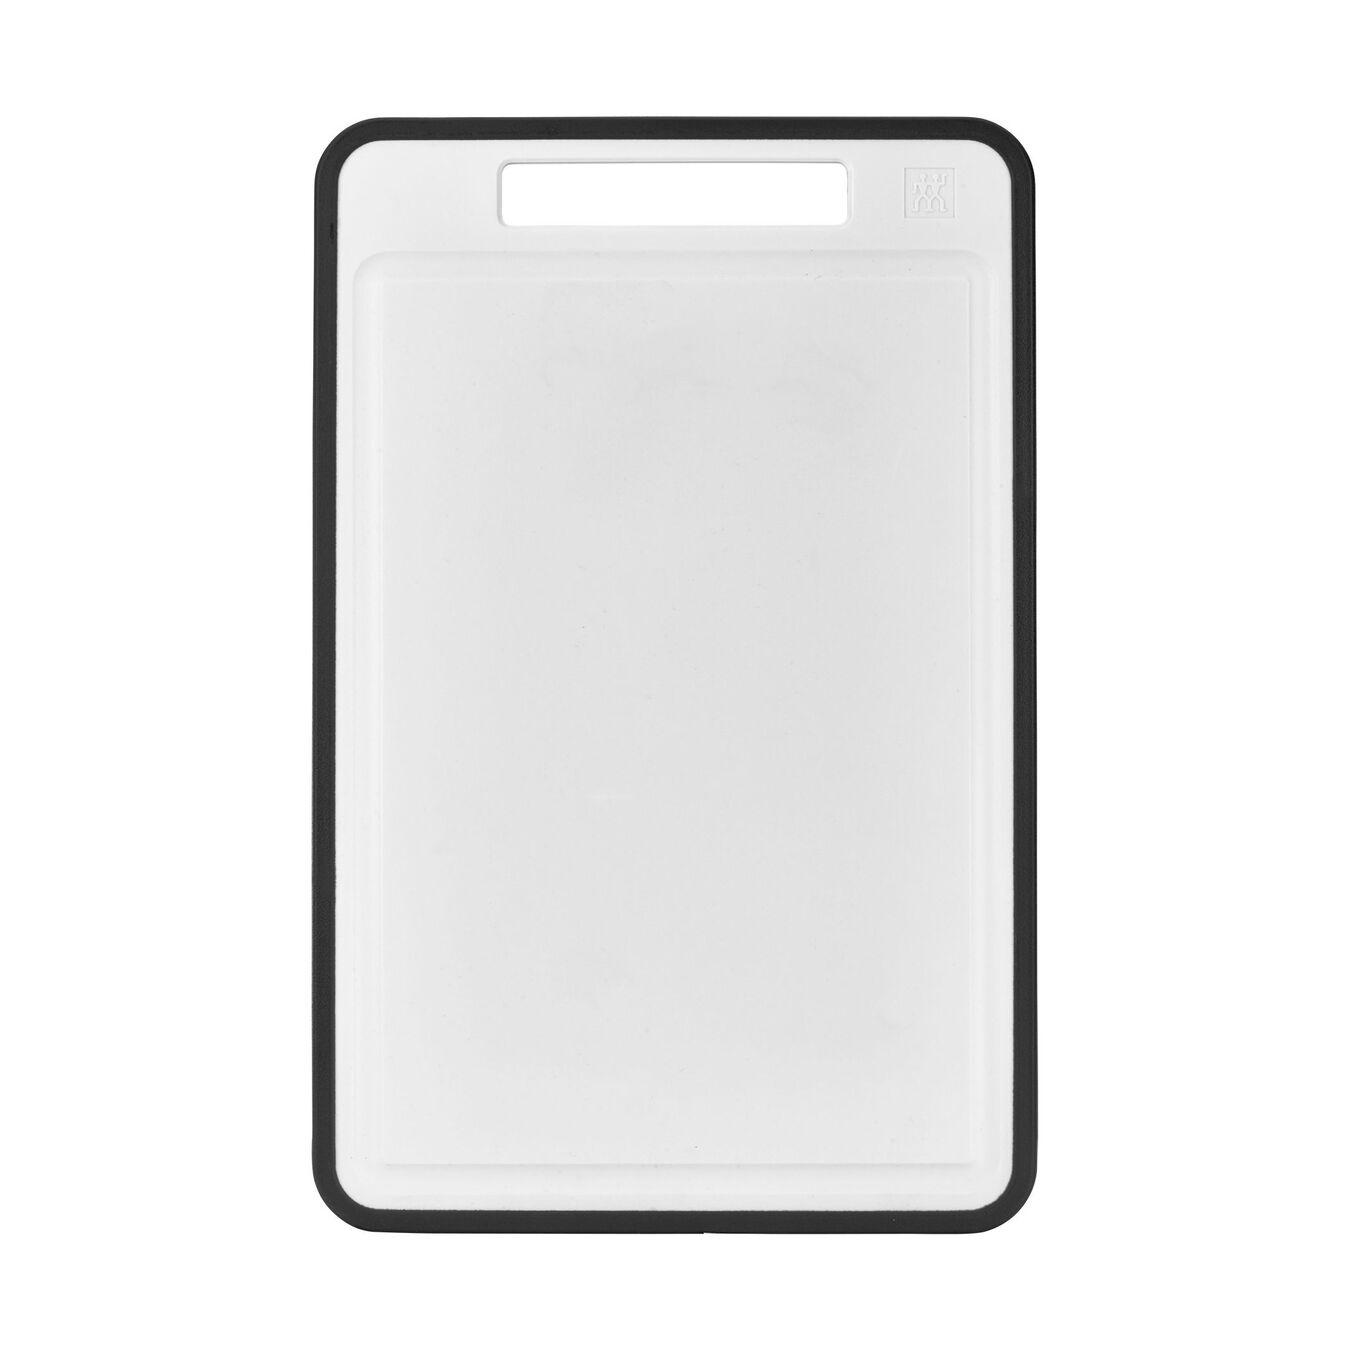 Plastic Cutting Board,,large 1